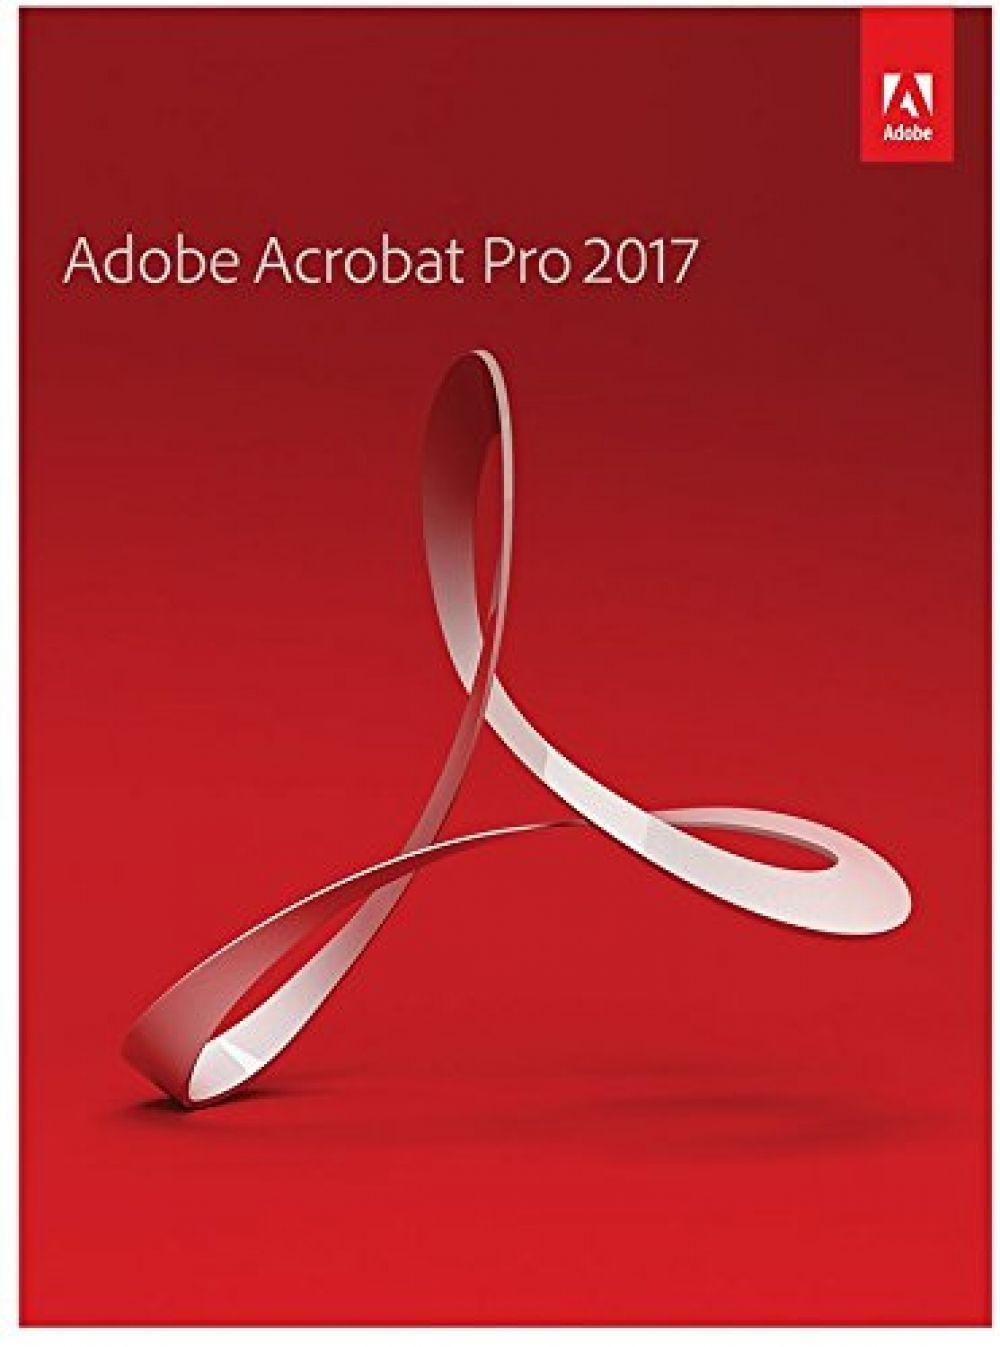 Adobe Acrobat Pro 2017 [PC DISC] Adobe acrobat, Adobe